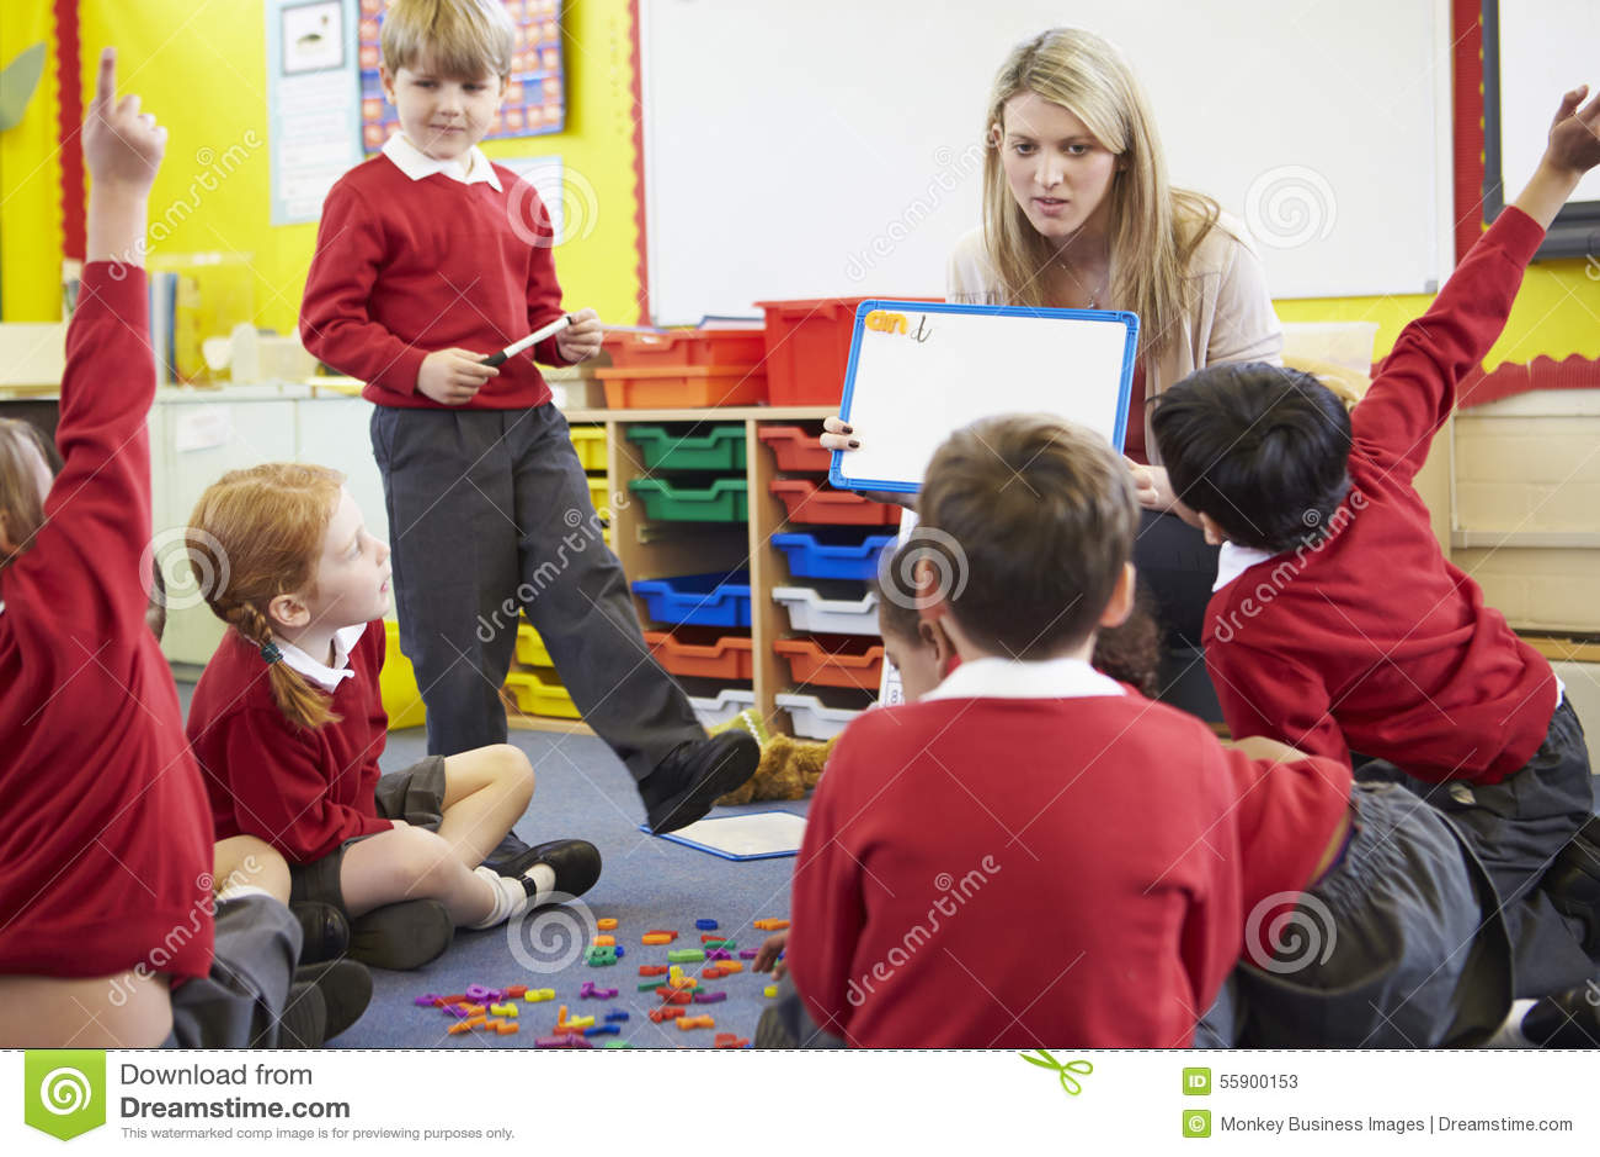 Teacher Teaching Spelling To Elementary School Pupils Stock Photo ...